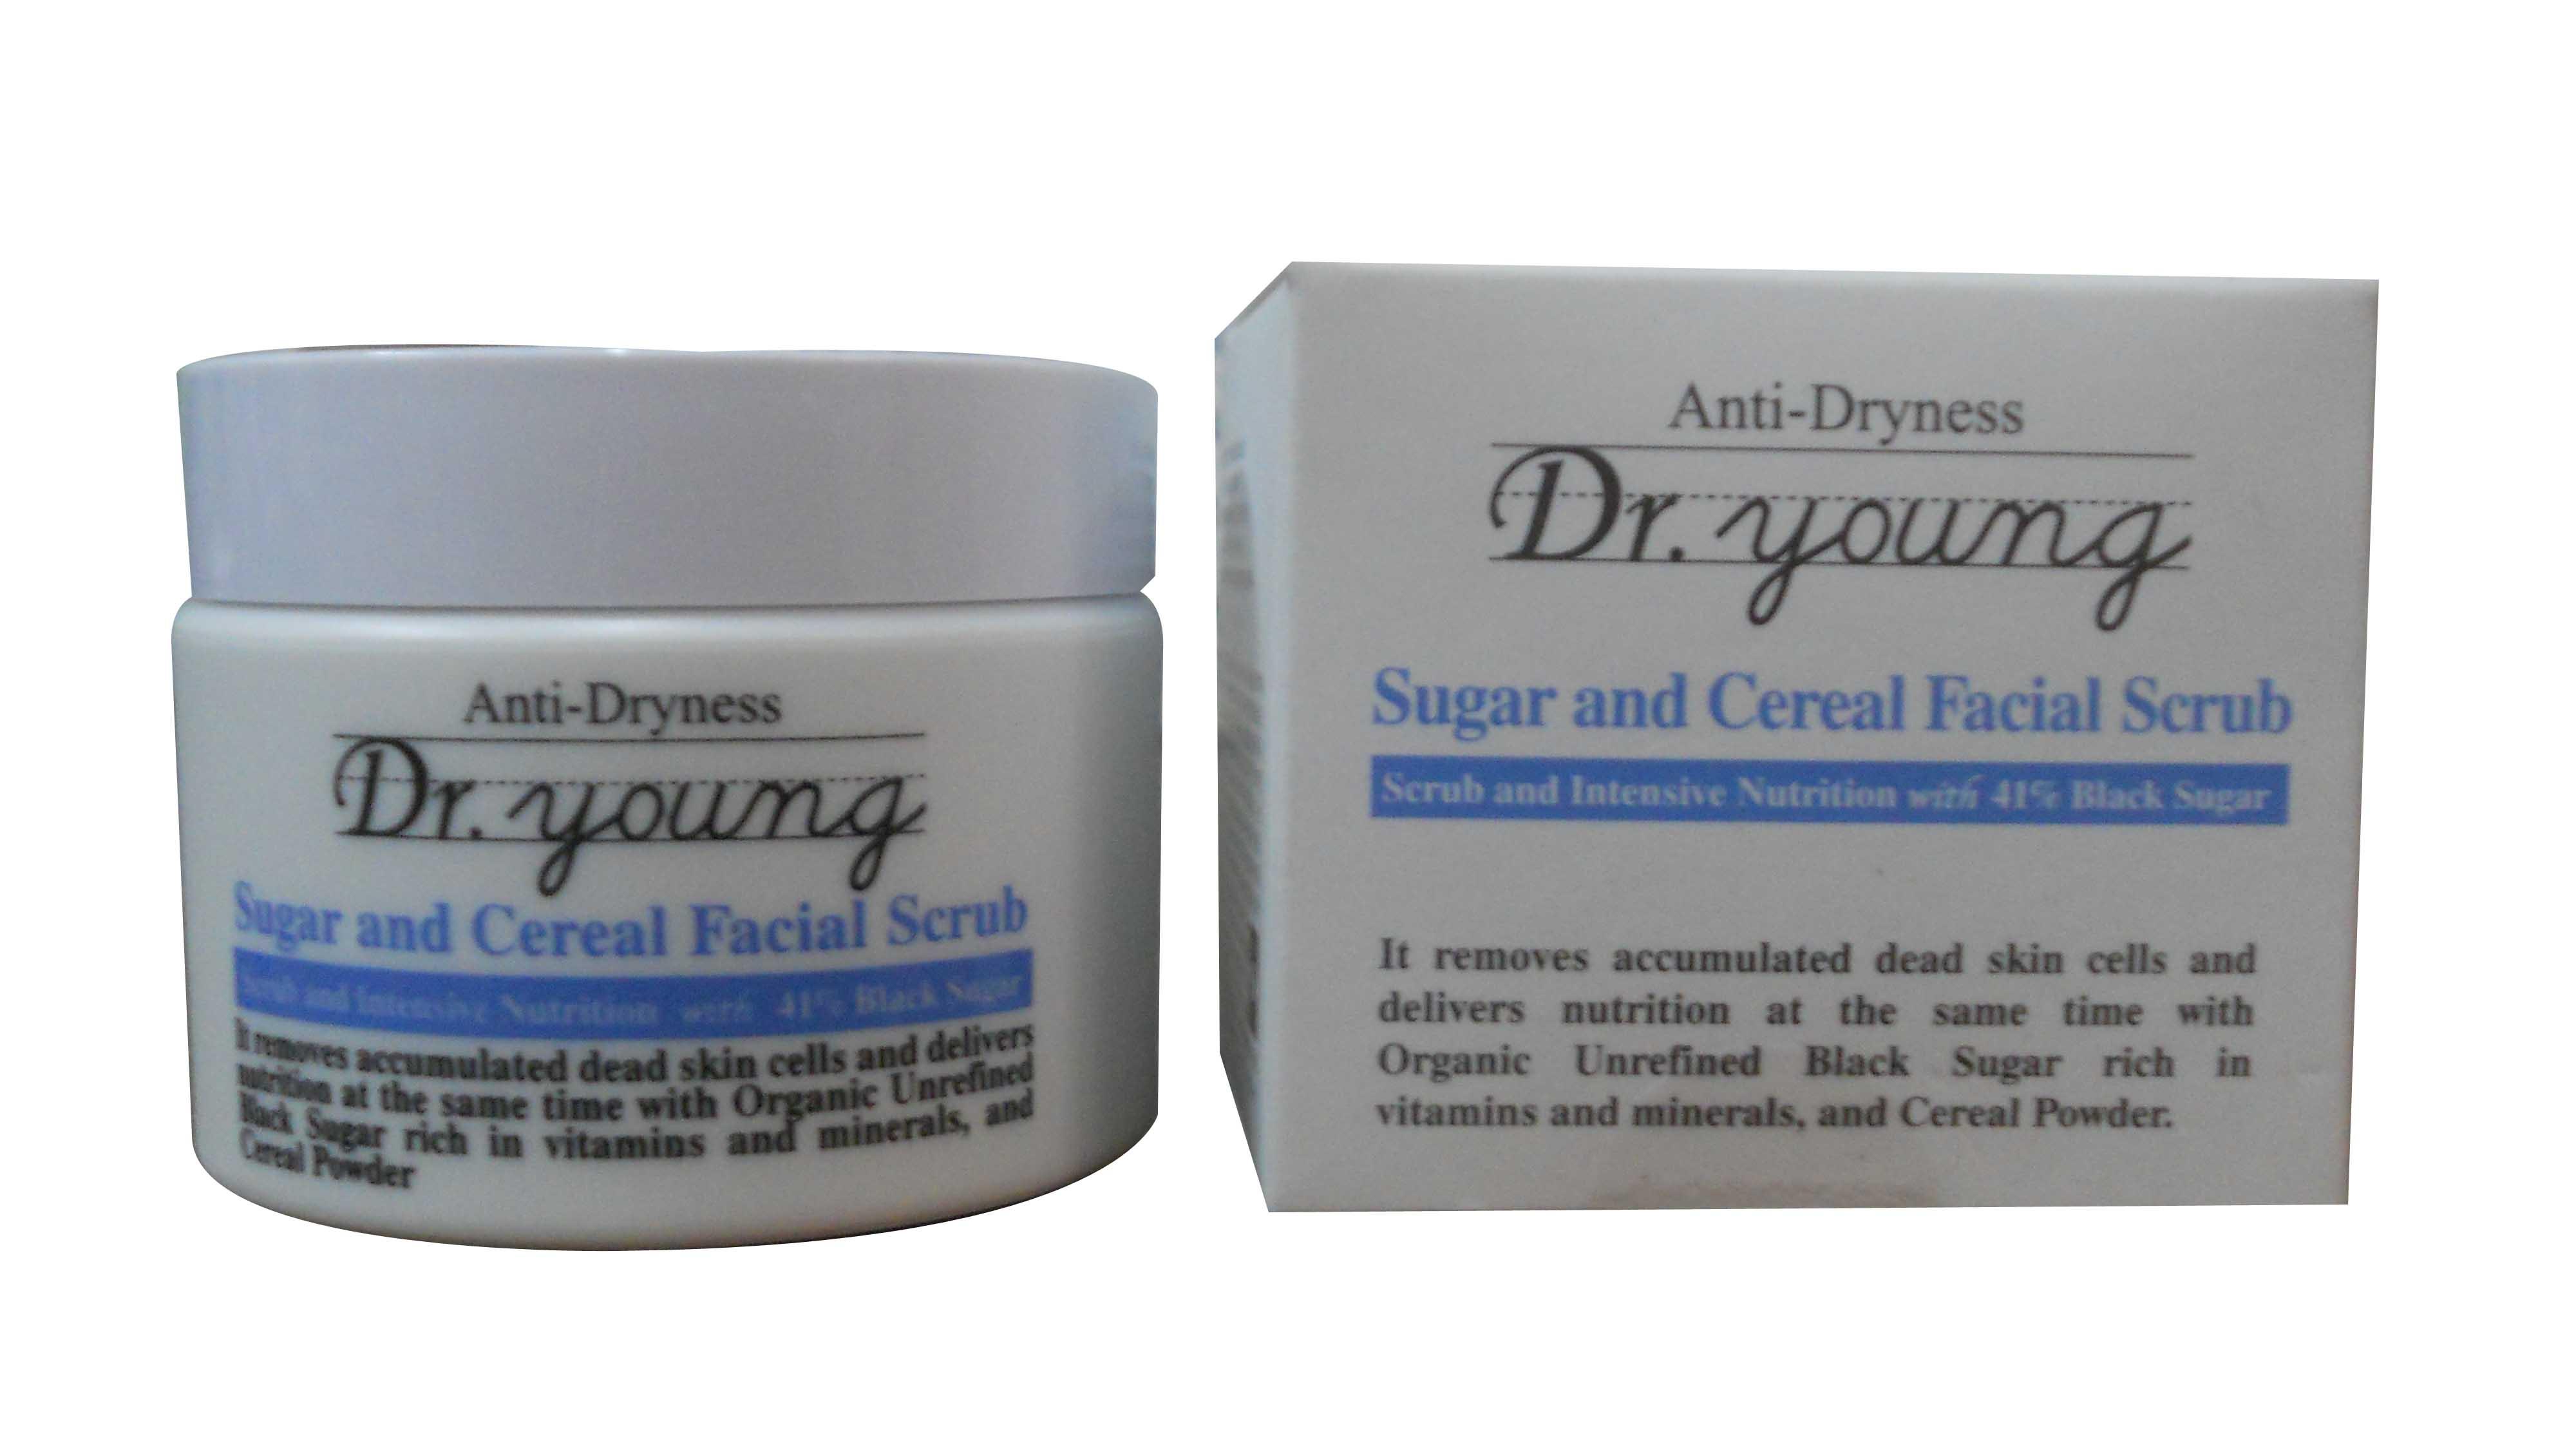 Anti-Dryness (Sugar and Cereal Facial Scrub)